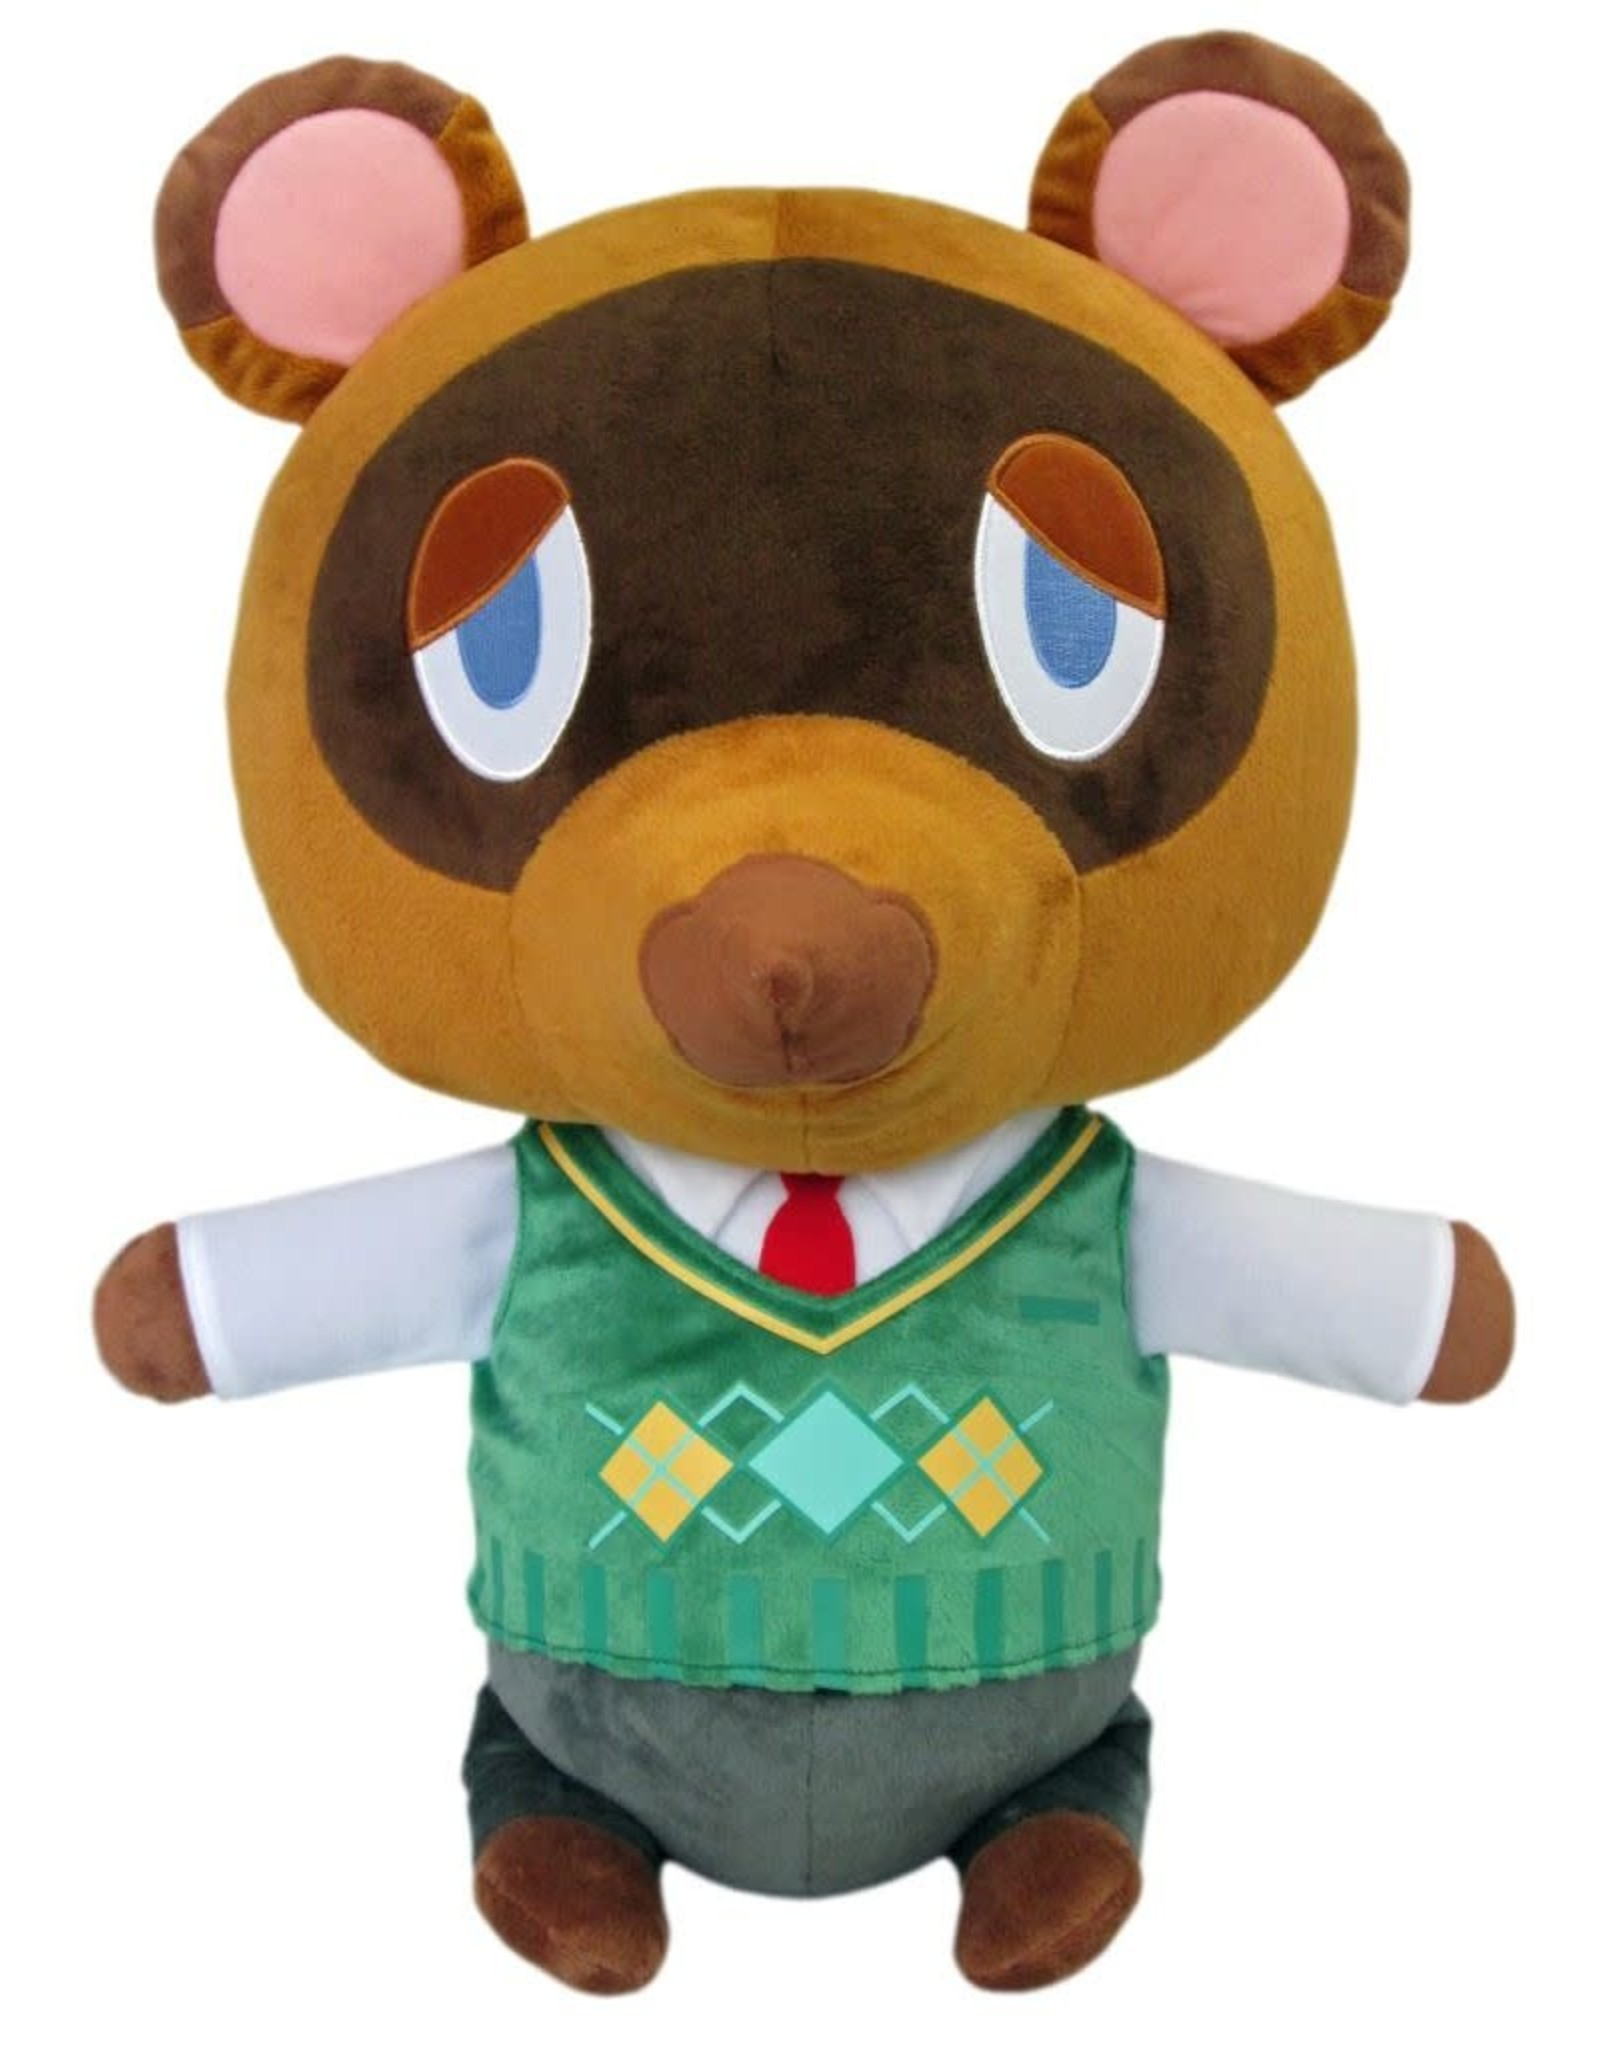 Animal Crossing BIG Plushie - Tom Nook - 50cm